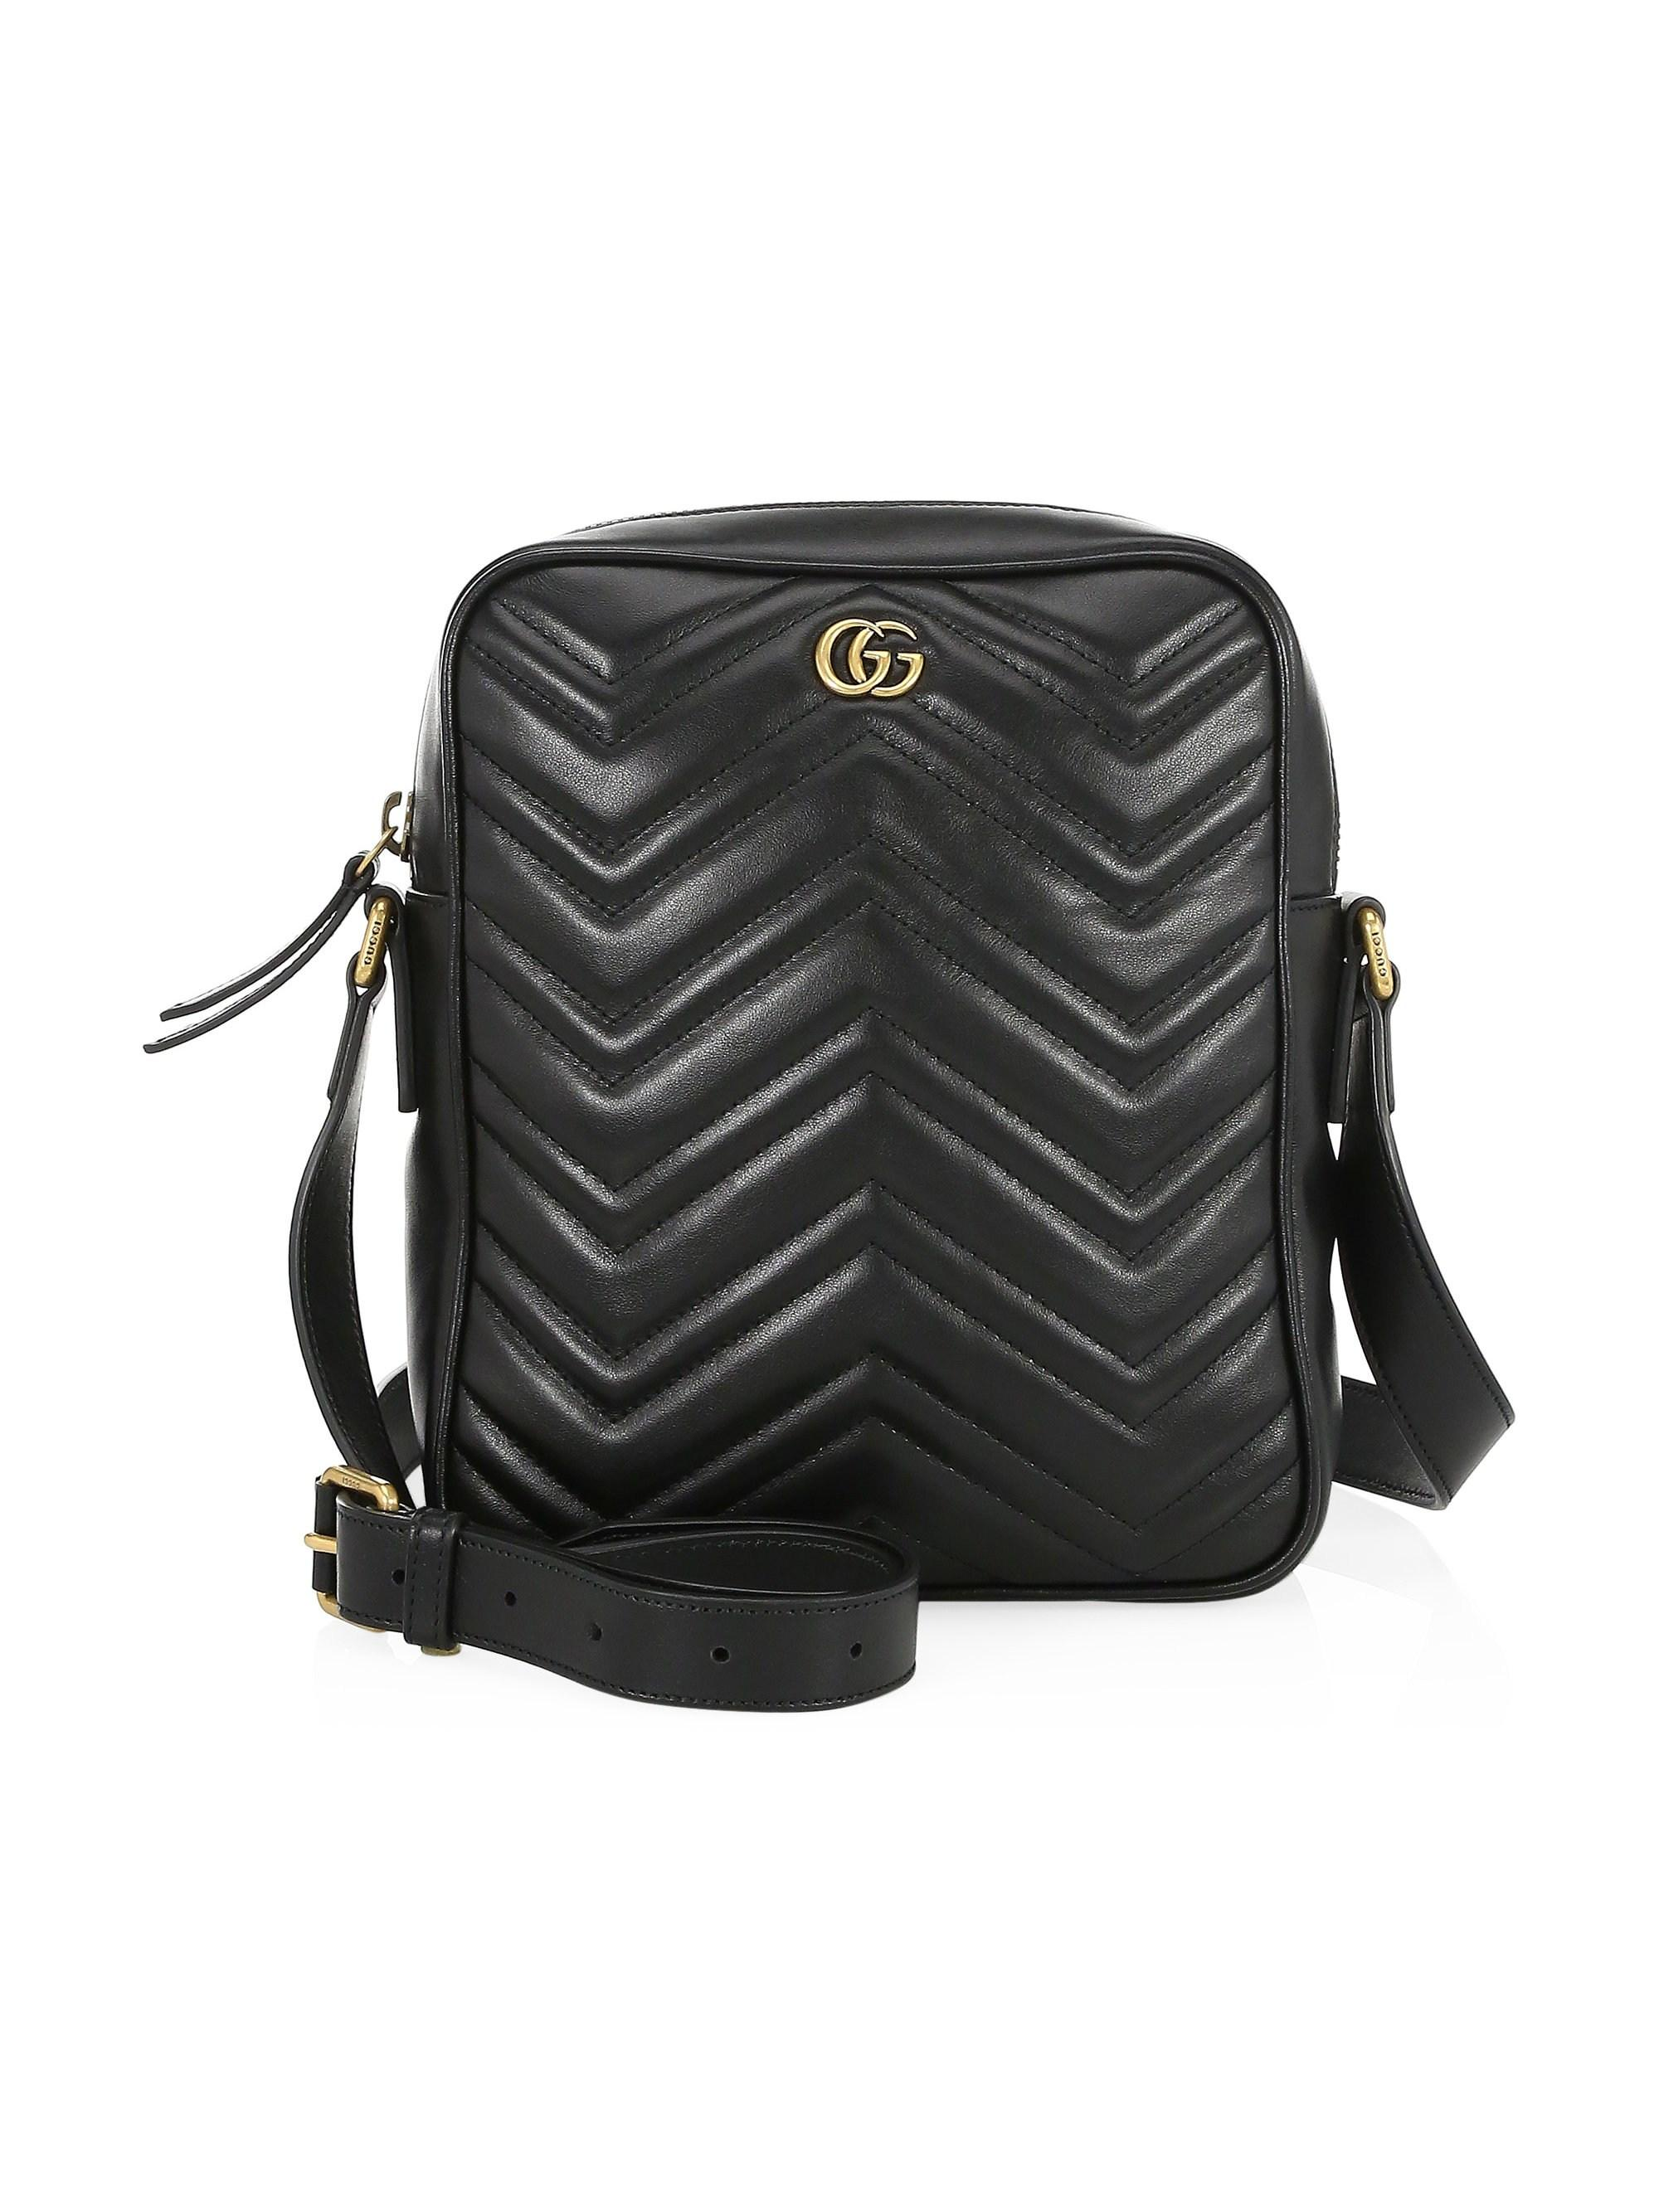 e66dab32270c0d Gucci Men's GG Marmont Leather Shoulder Bag - Nero in Black for Men ...